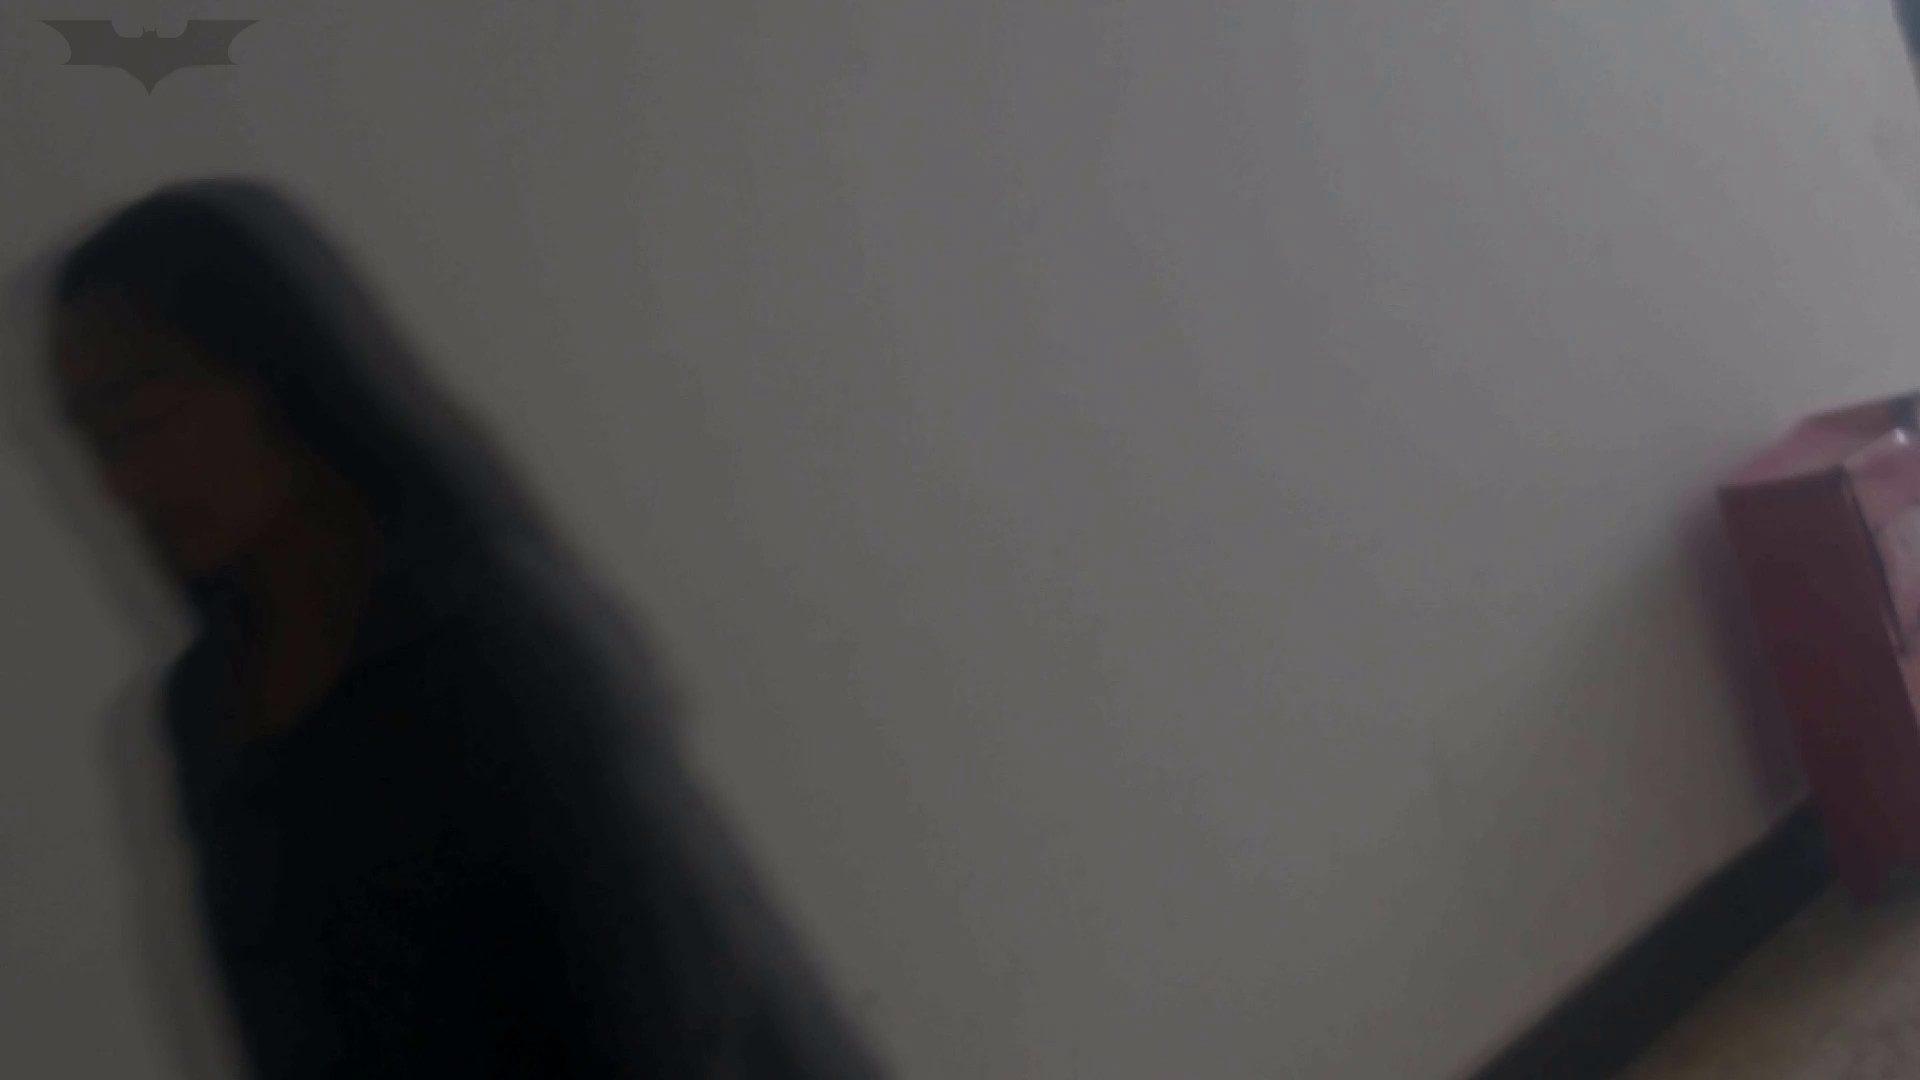 JD盗撮 美女の洗面所の秘密 Vol.05 エッチな盗撮 オメコ動画キャプチャ 107pic 73